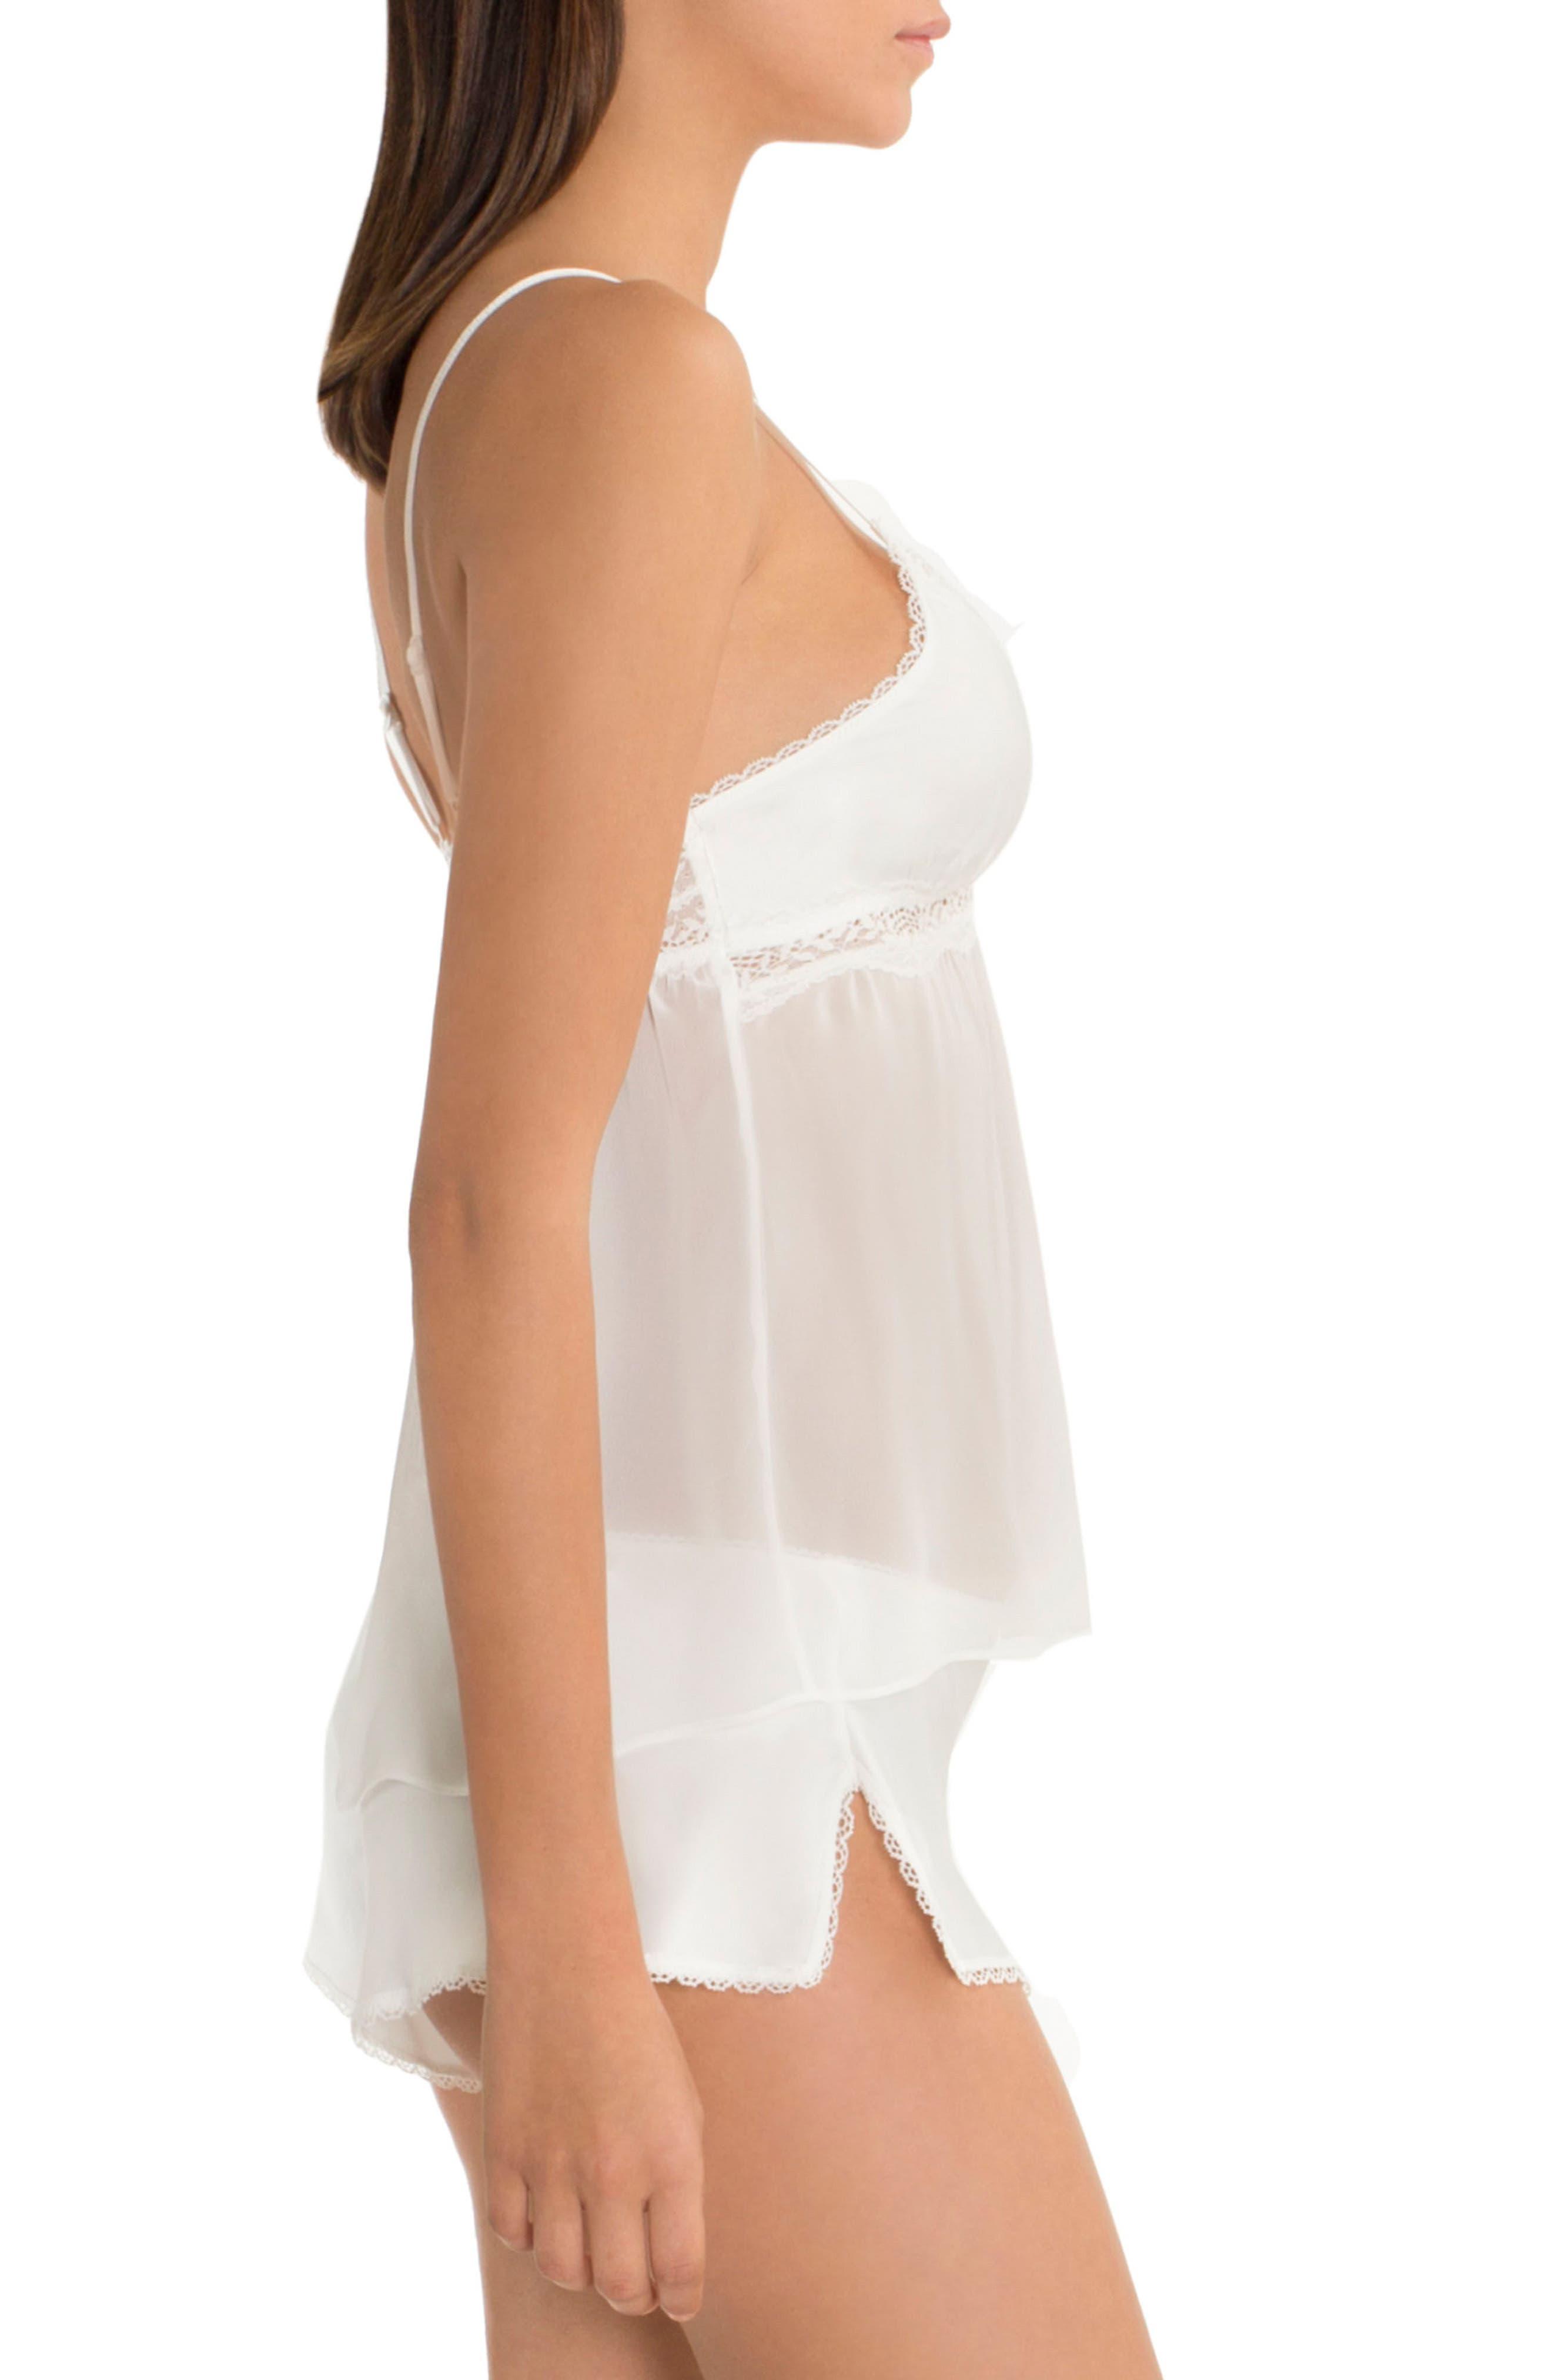 Marble Wash Pajamas,                             Alternate thumbnail 3, color,                             Off White